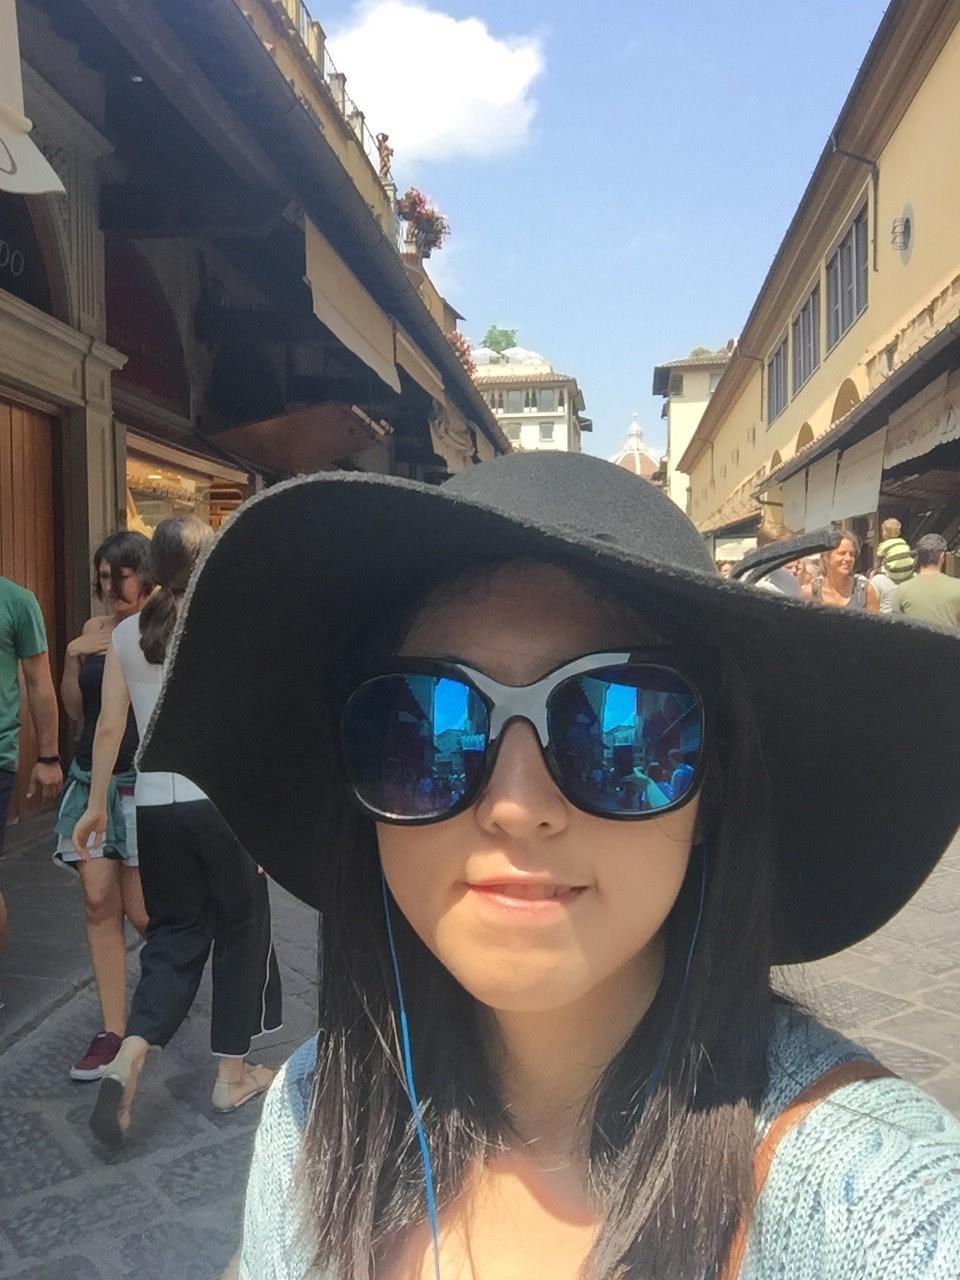 CAPAStudyAbroad_Florence_Summer2017_From Jiwon Choi Ponte Vecchio 1.jpg